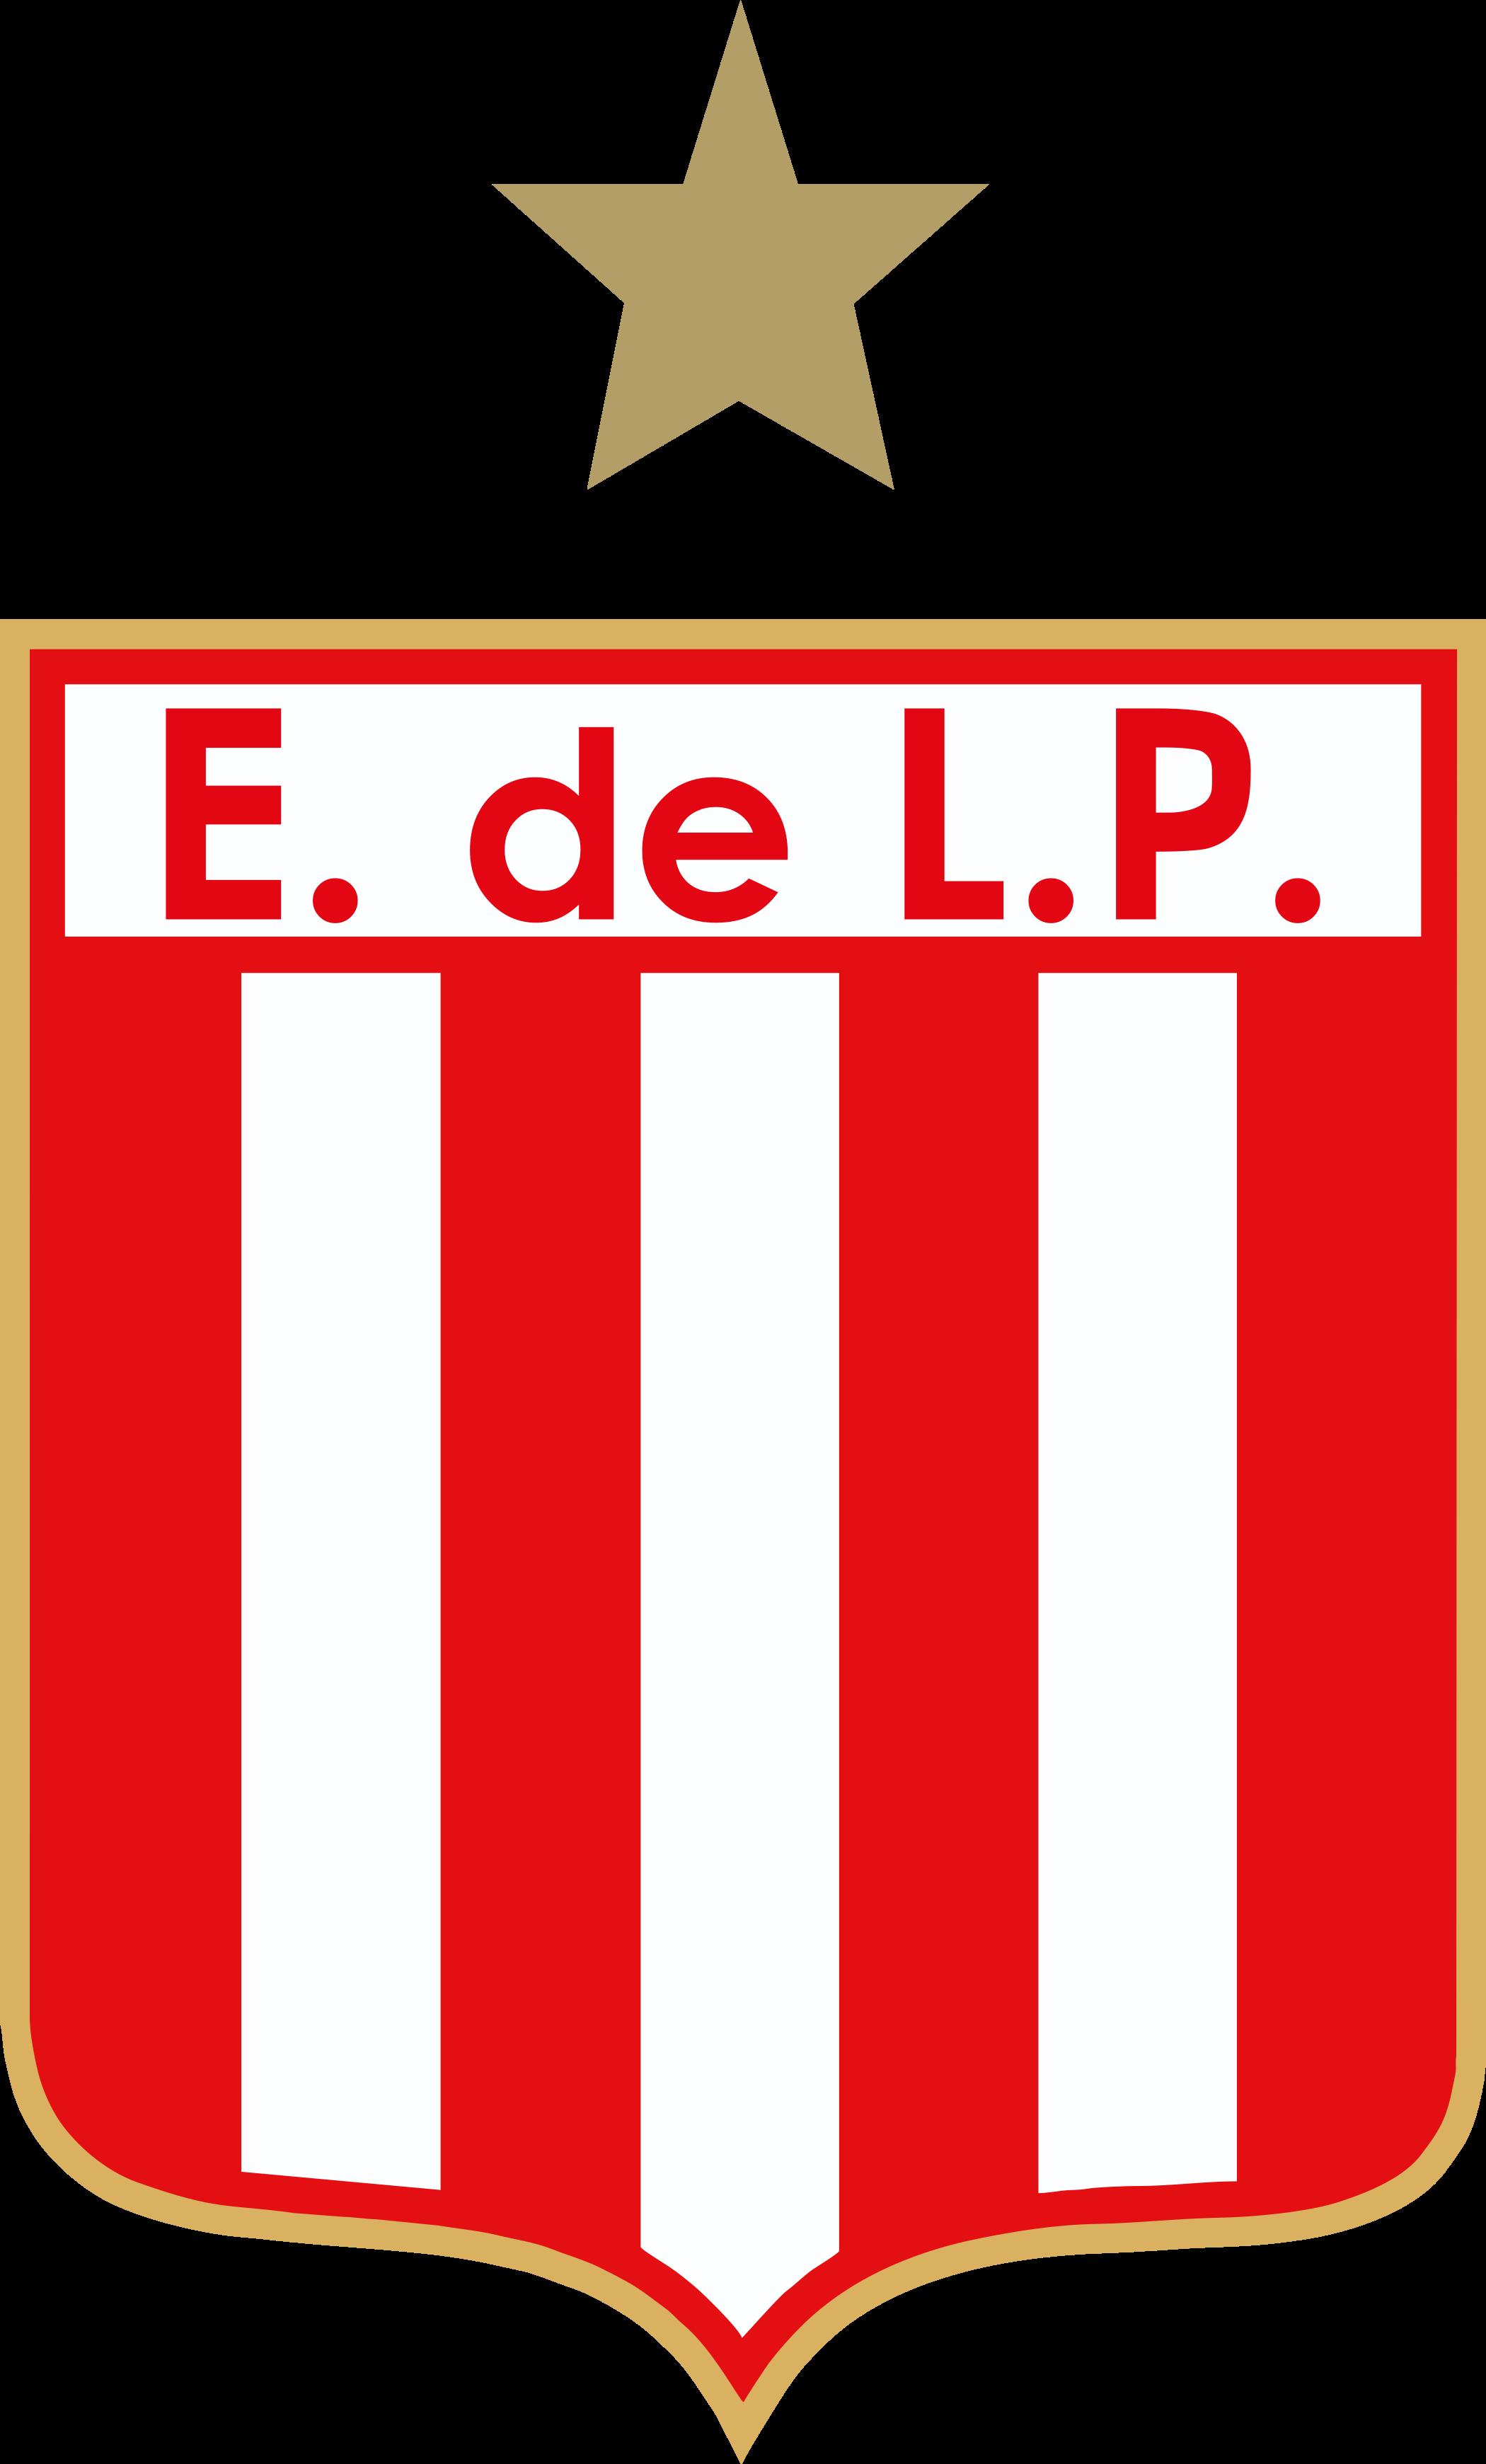 estudiantes logo escudo 3 - Estudiantes de La Plata Logo - Escudo